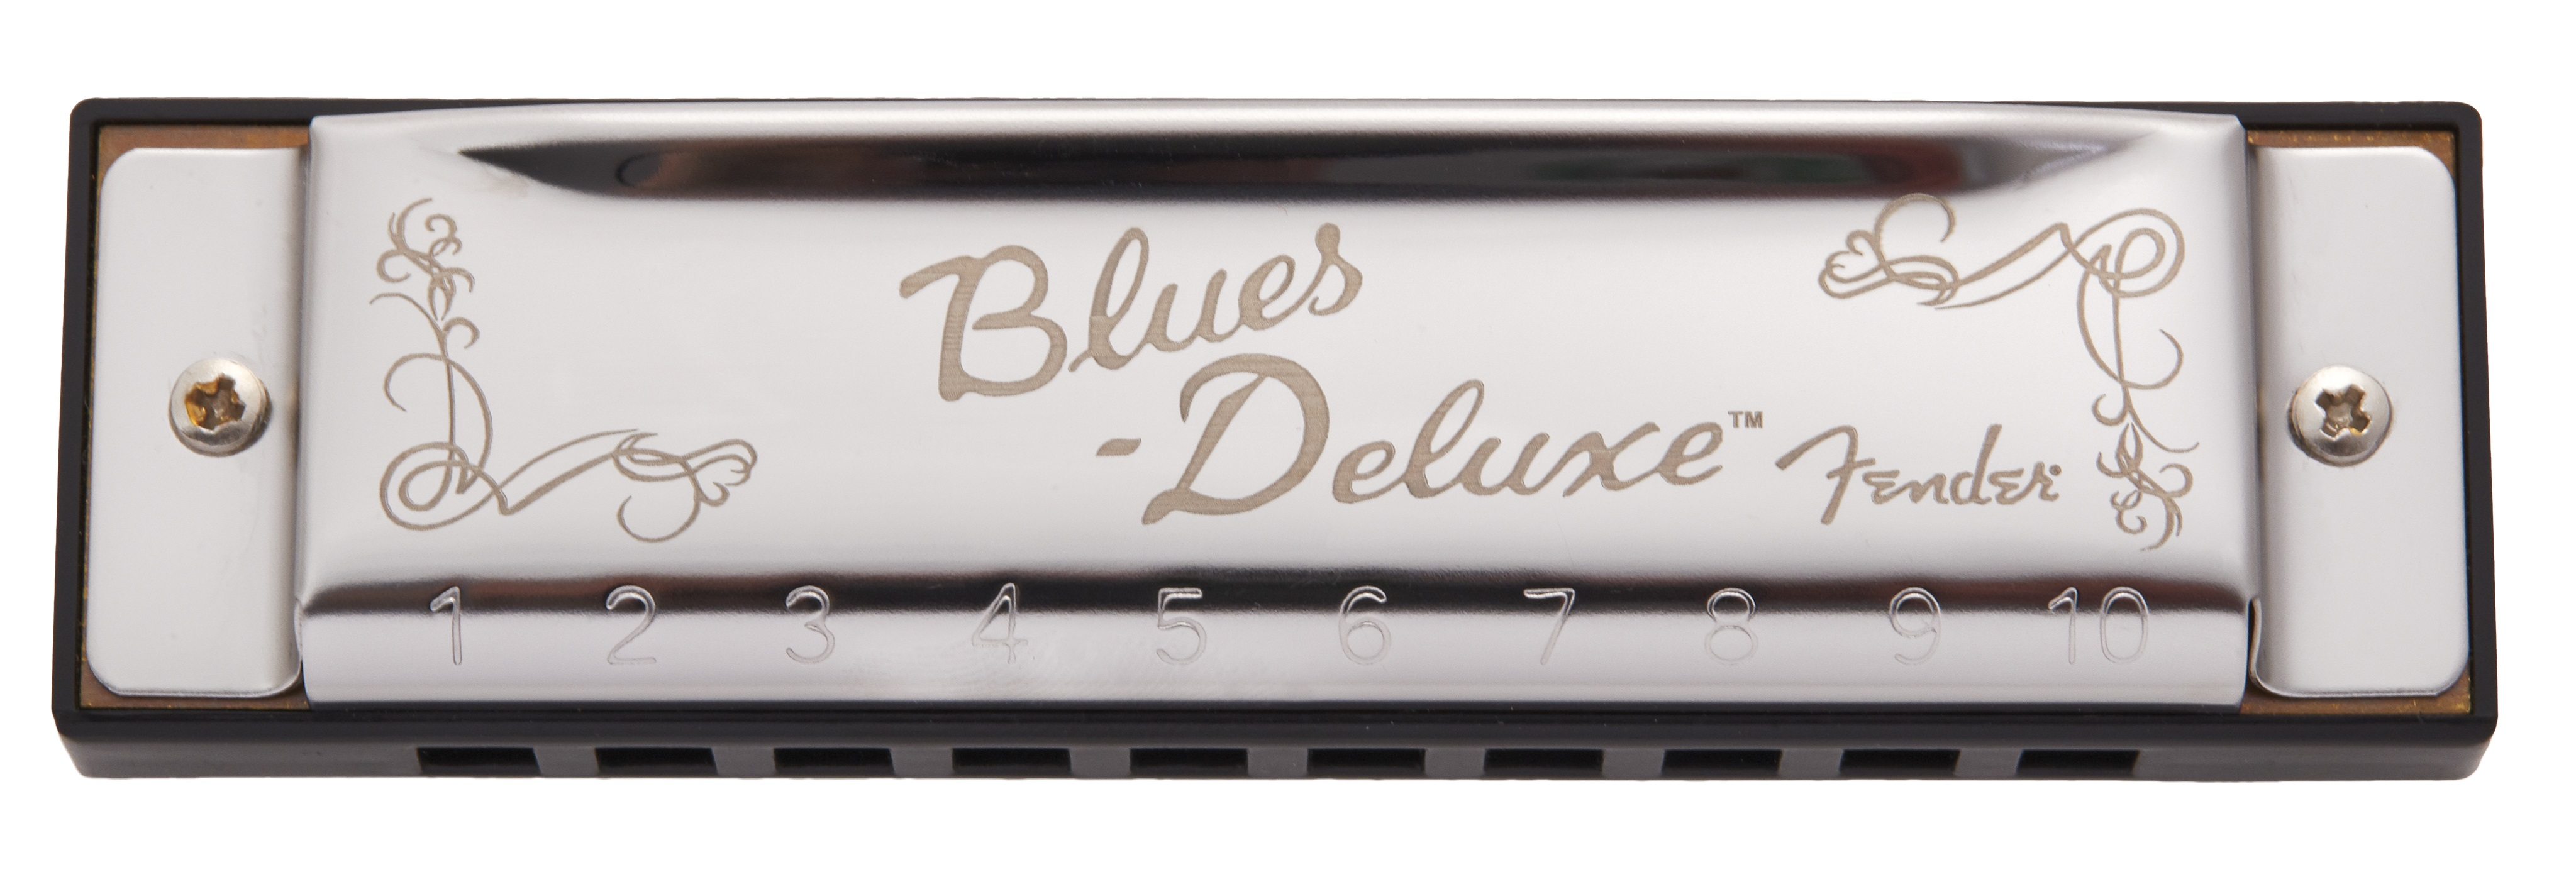 Fender Blues Deluxe Key of E